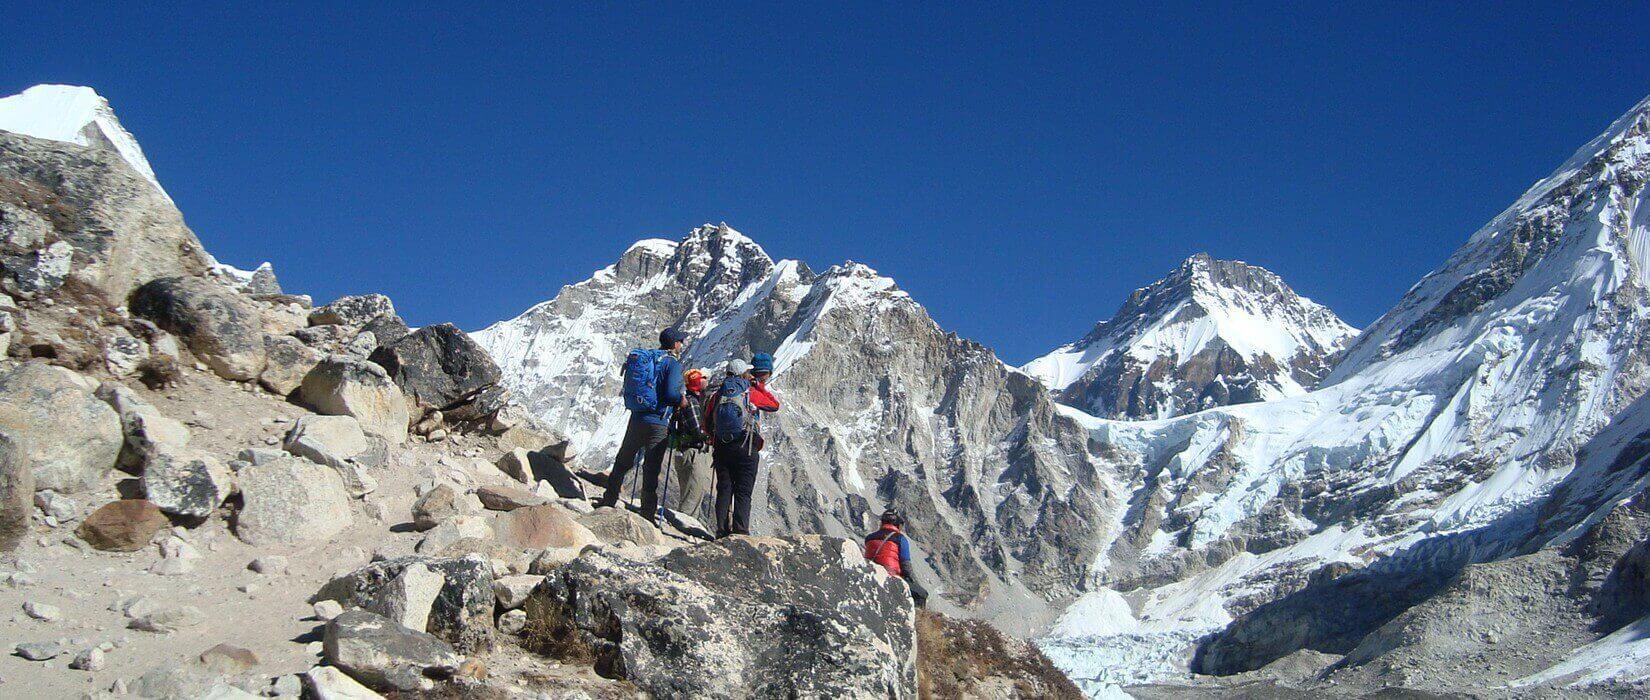 Explore Everest Base Camp Trekking 2020